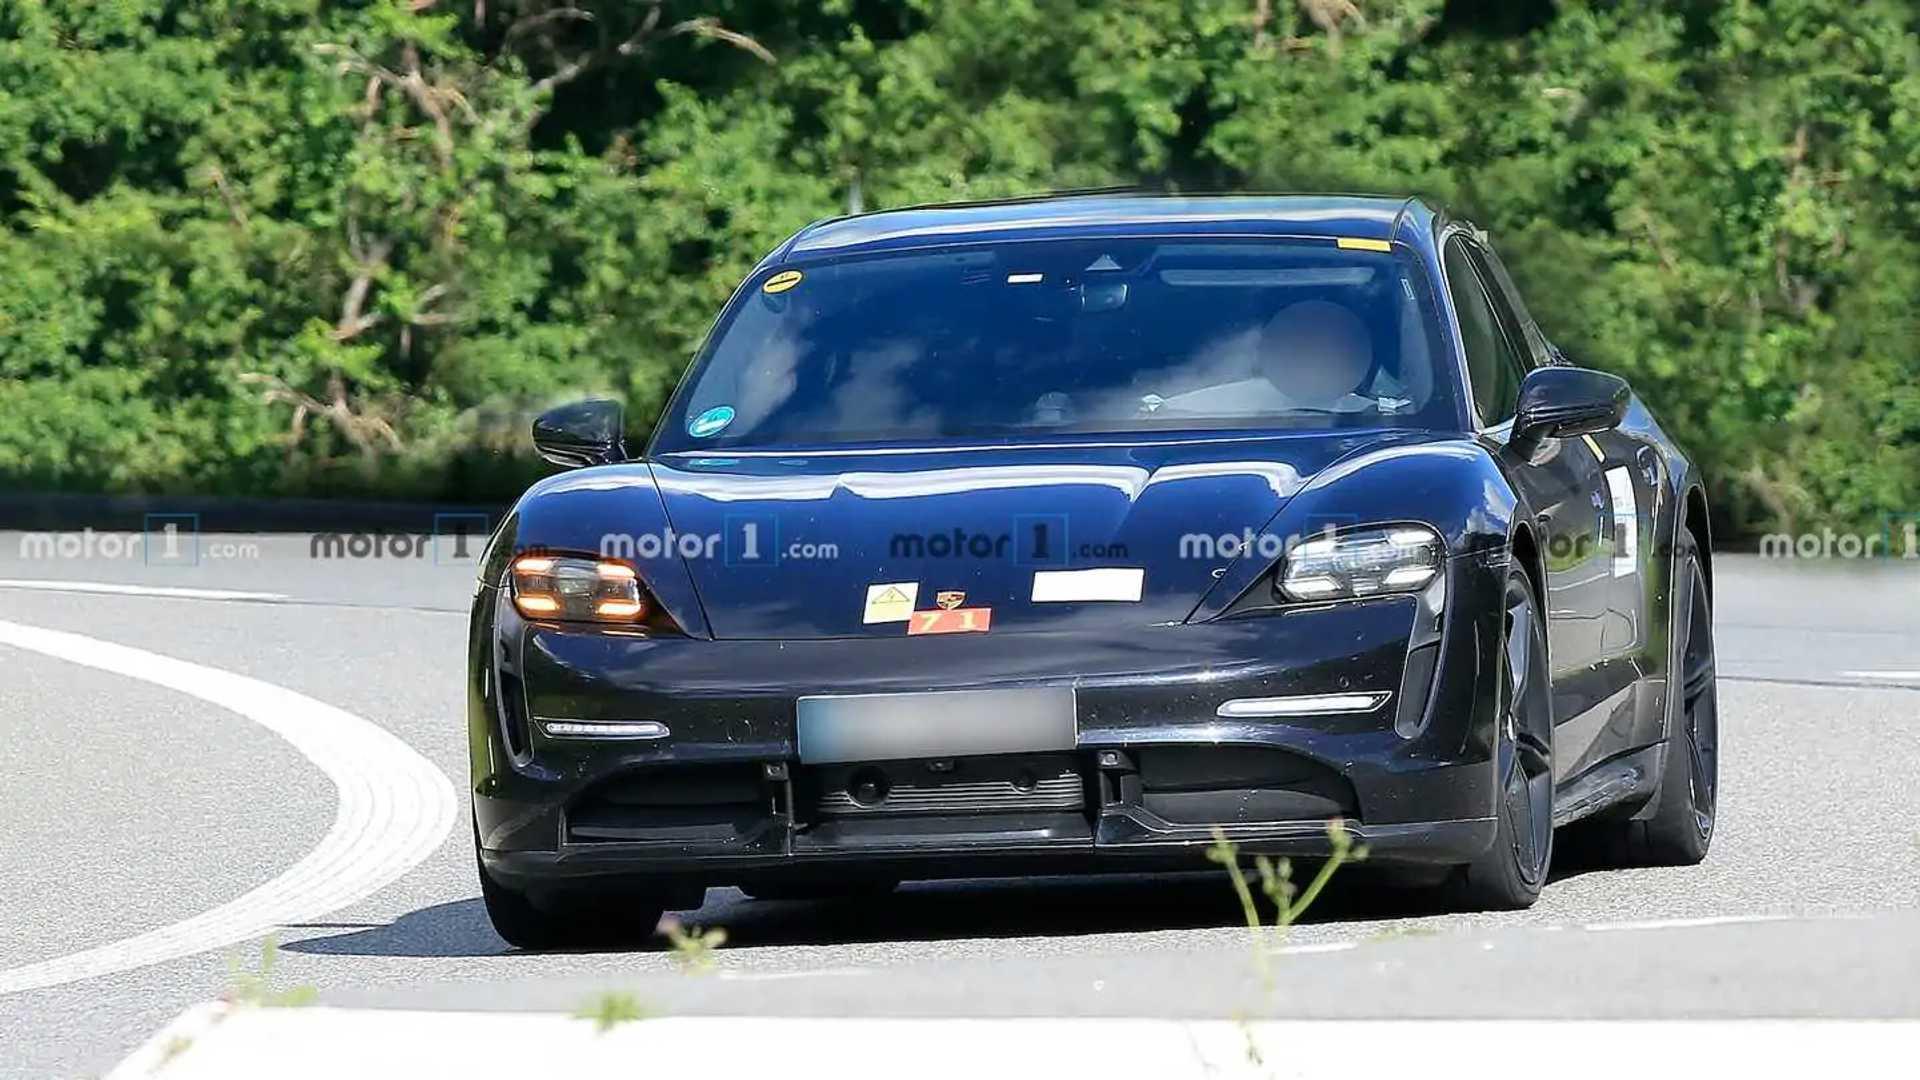 2020 - [Porsche] Taycan Sport Turismo - Page 2 New-porsche-taycan-cross-turismo-spy-photos